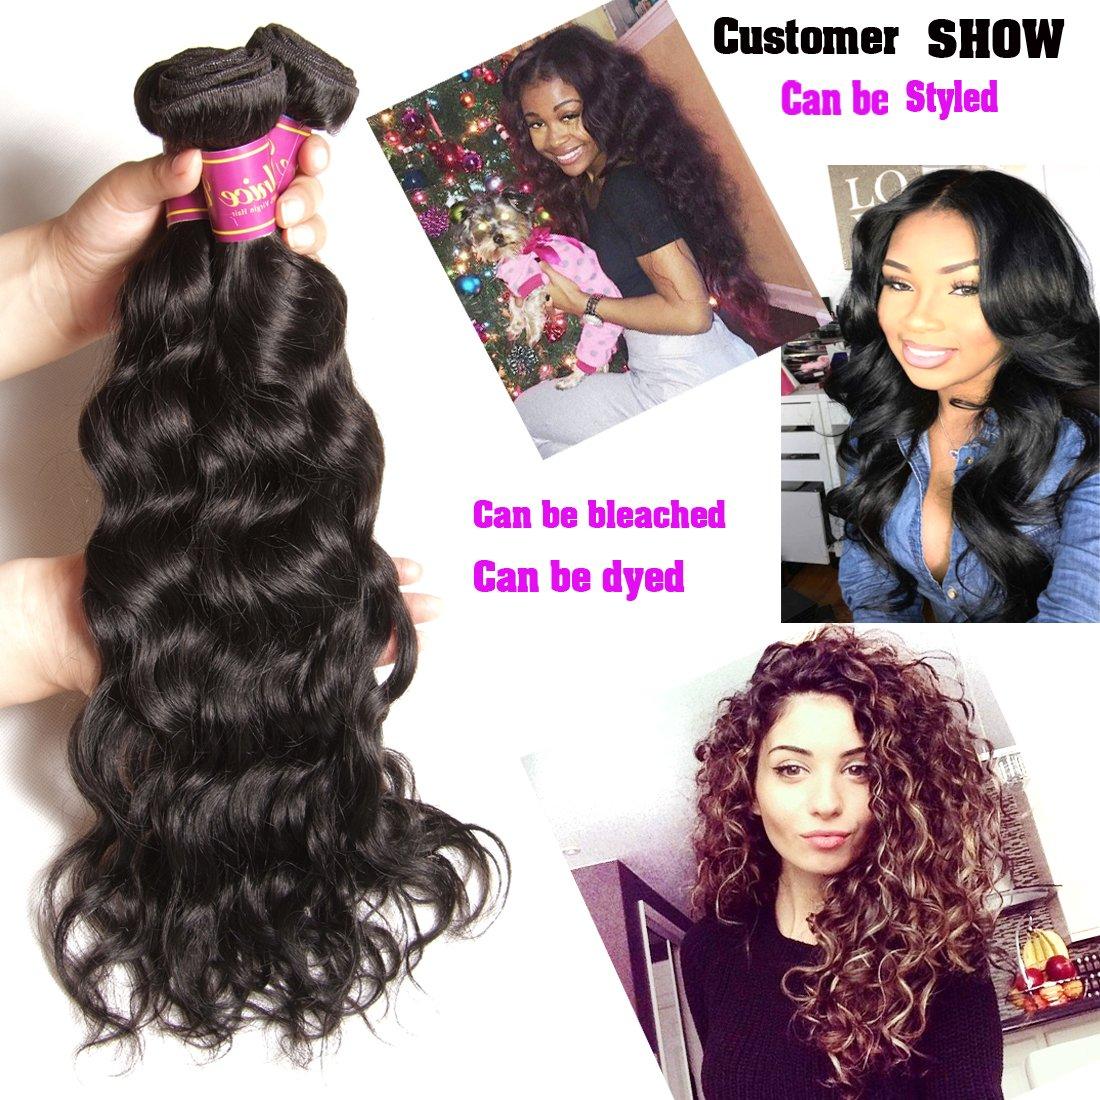 Unice 7A Grade Brazilian Natural Wave Hair 100% Virgin Human Hair 3 Bundles with Closure Natural Color (20 22 24+18Free Closure) by UNICE (Image #2)